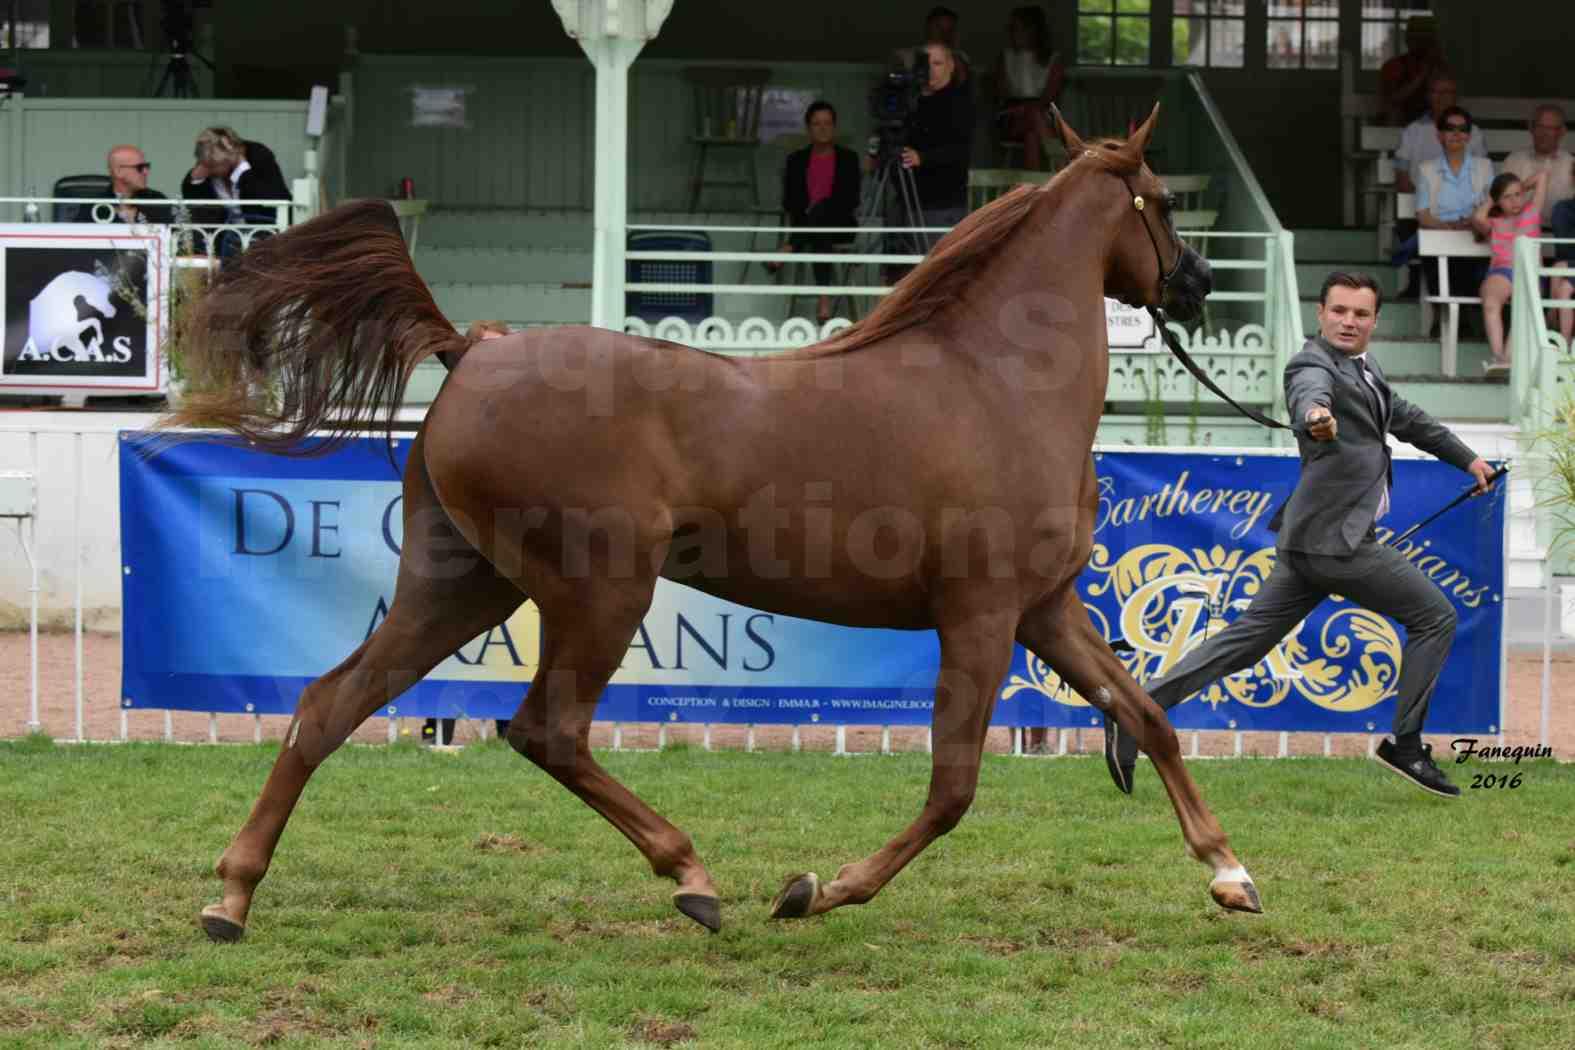 International Arabian Horse Show B de VICHY 2016 - PEARL DE DJOON - Notre Sélection - 09